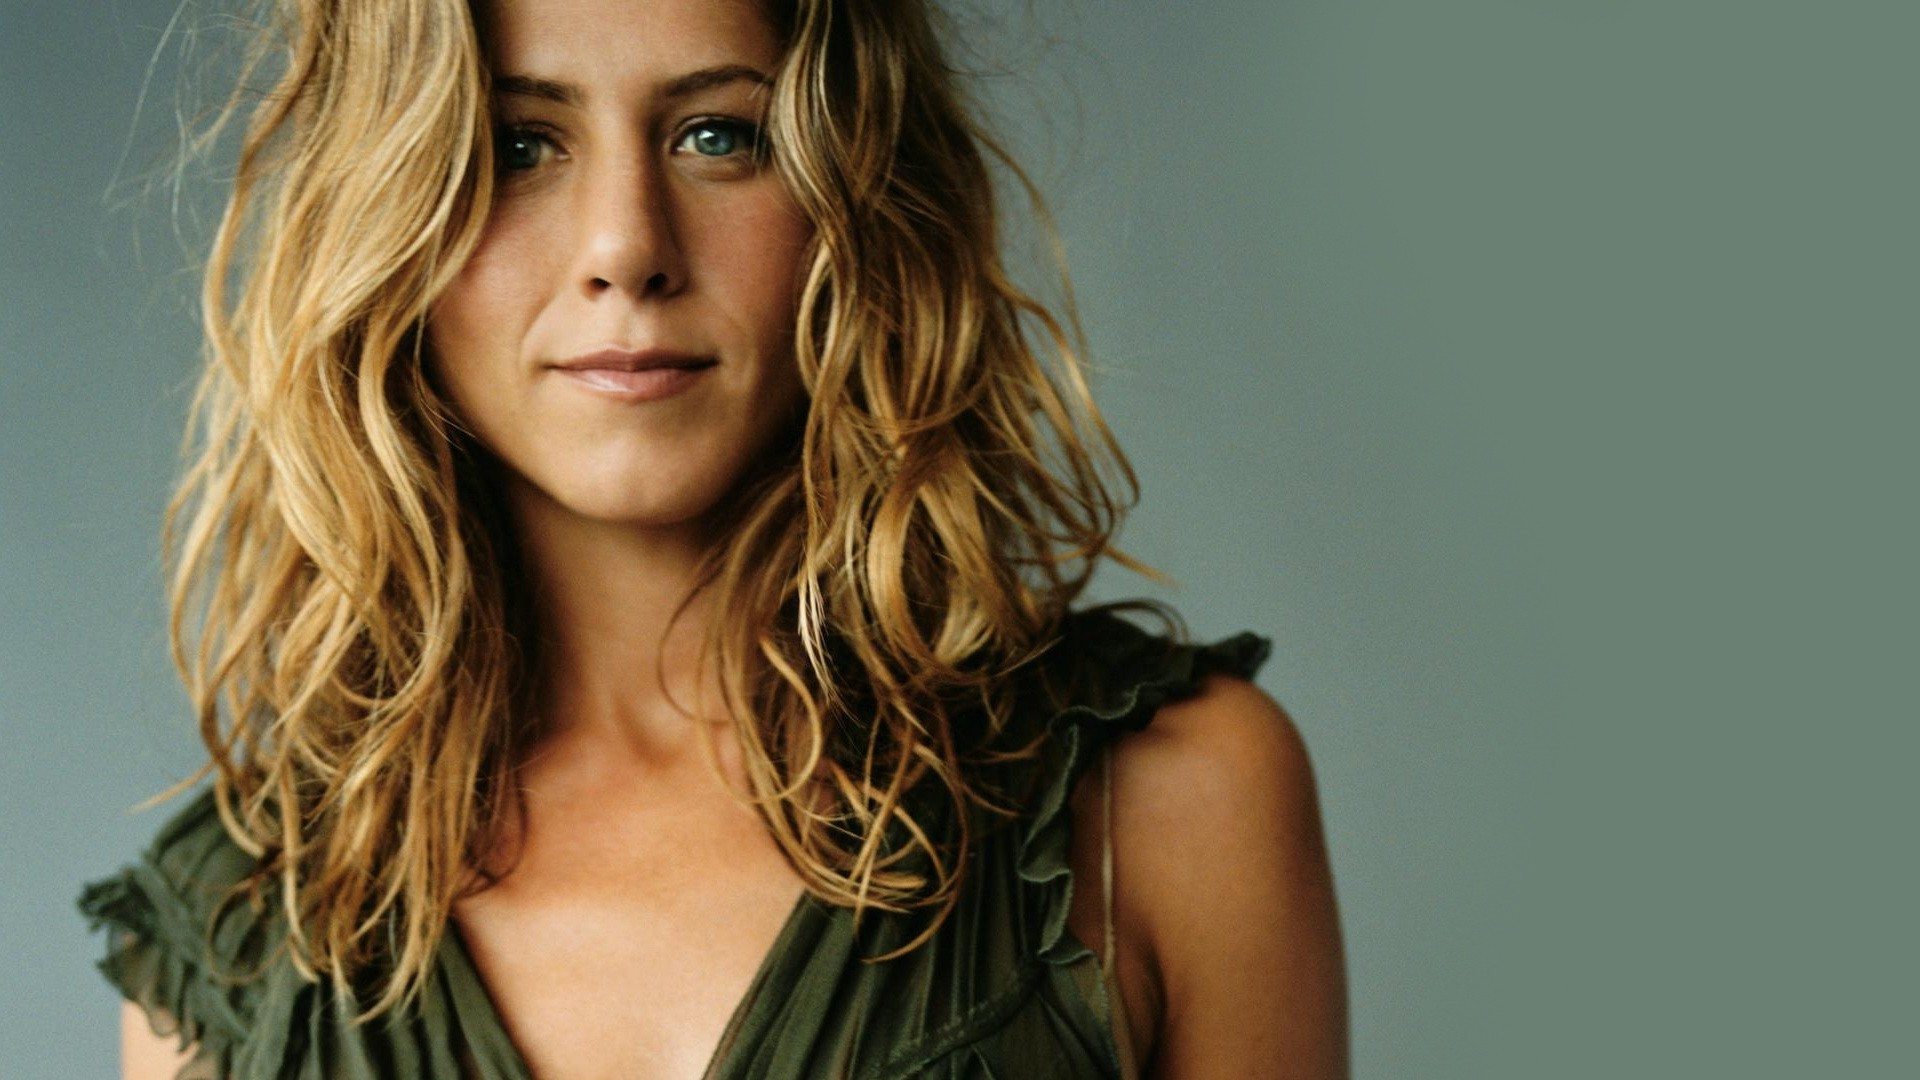 Jennifer Aniston Computer Wallpaper